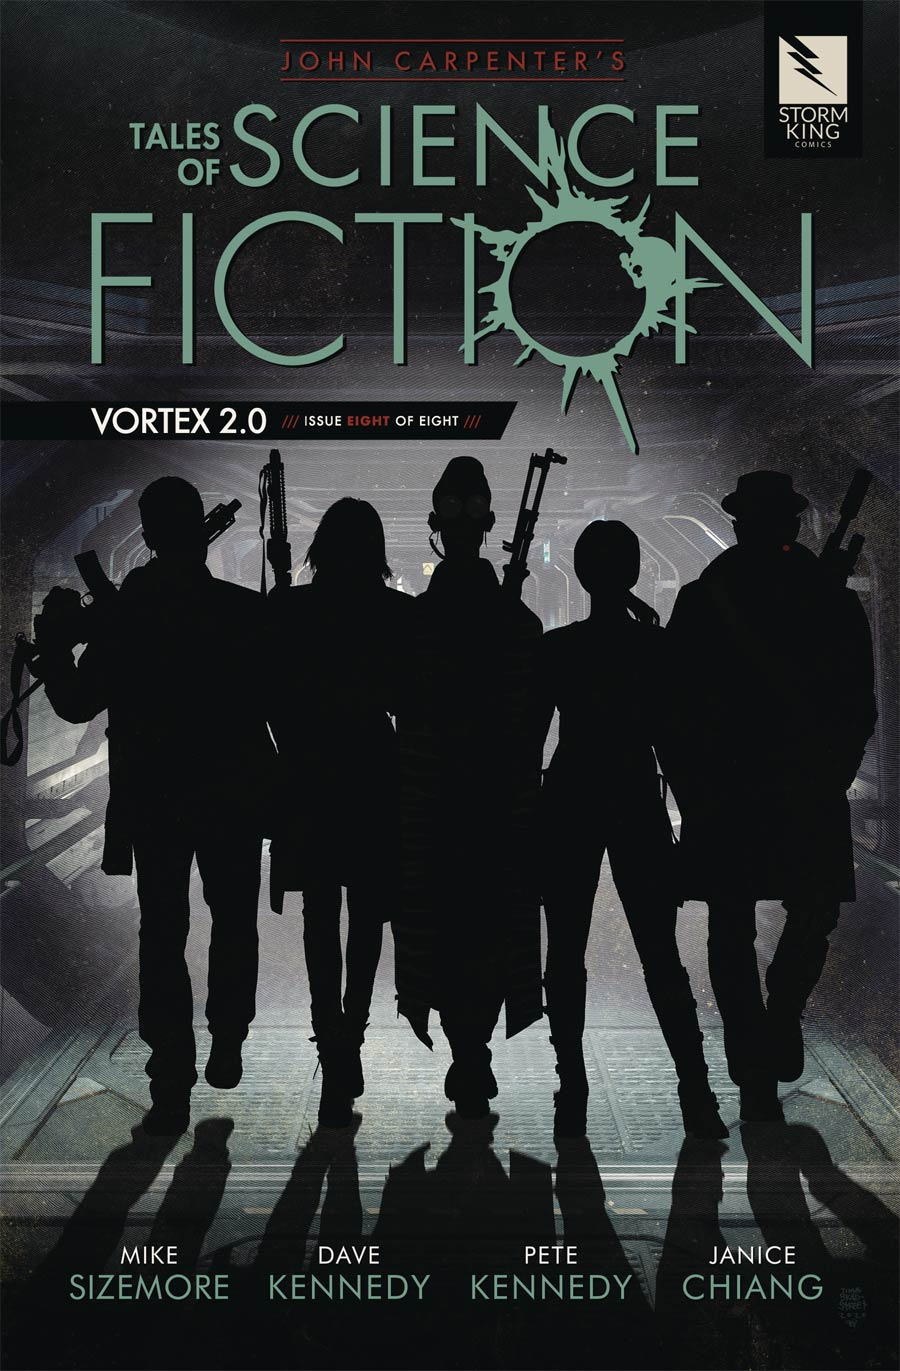 John Carpenters Tales Of Science Fiction Vortex 2.0 #8